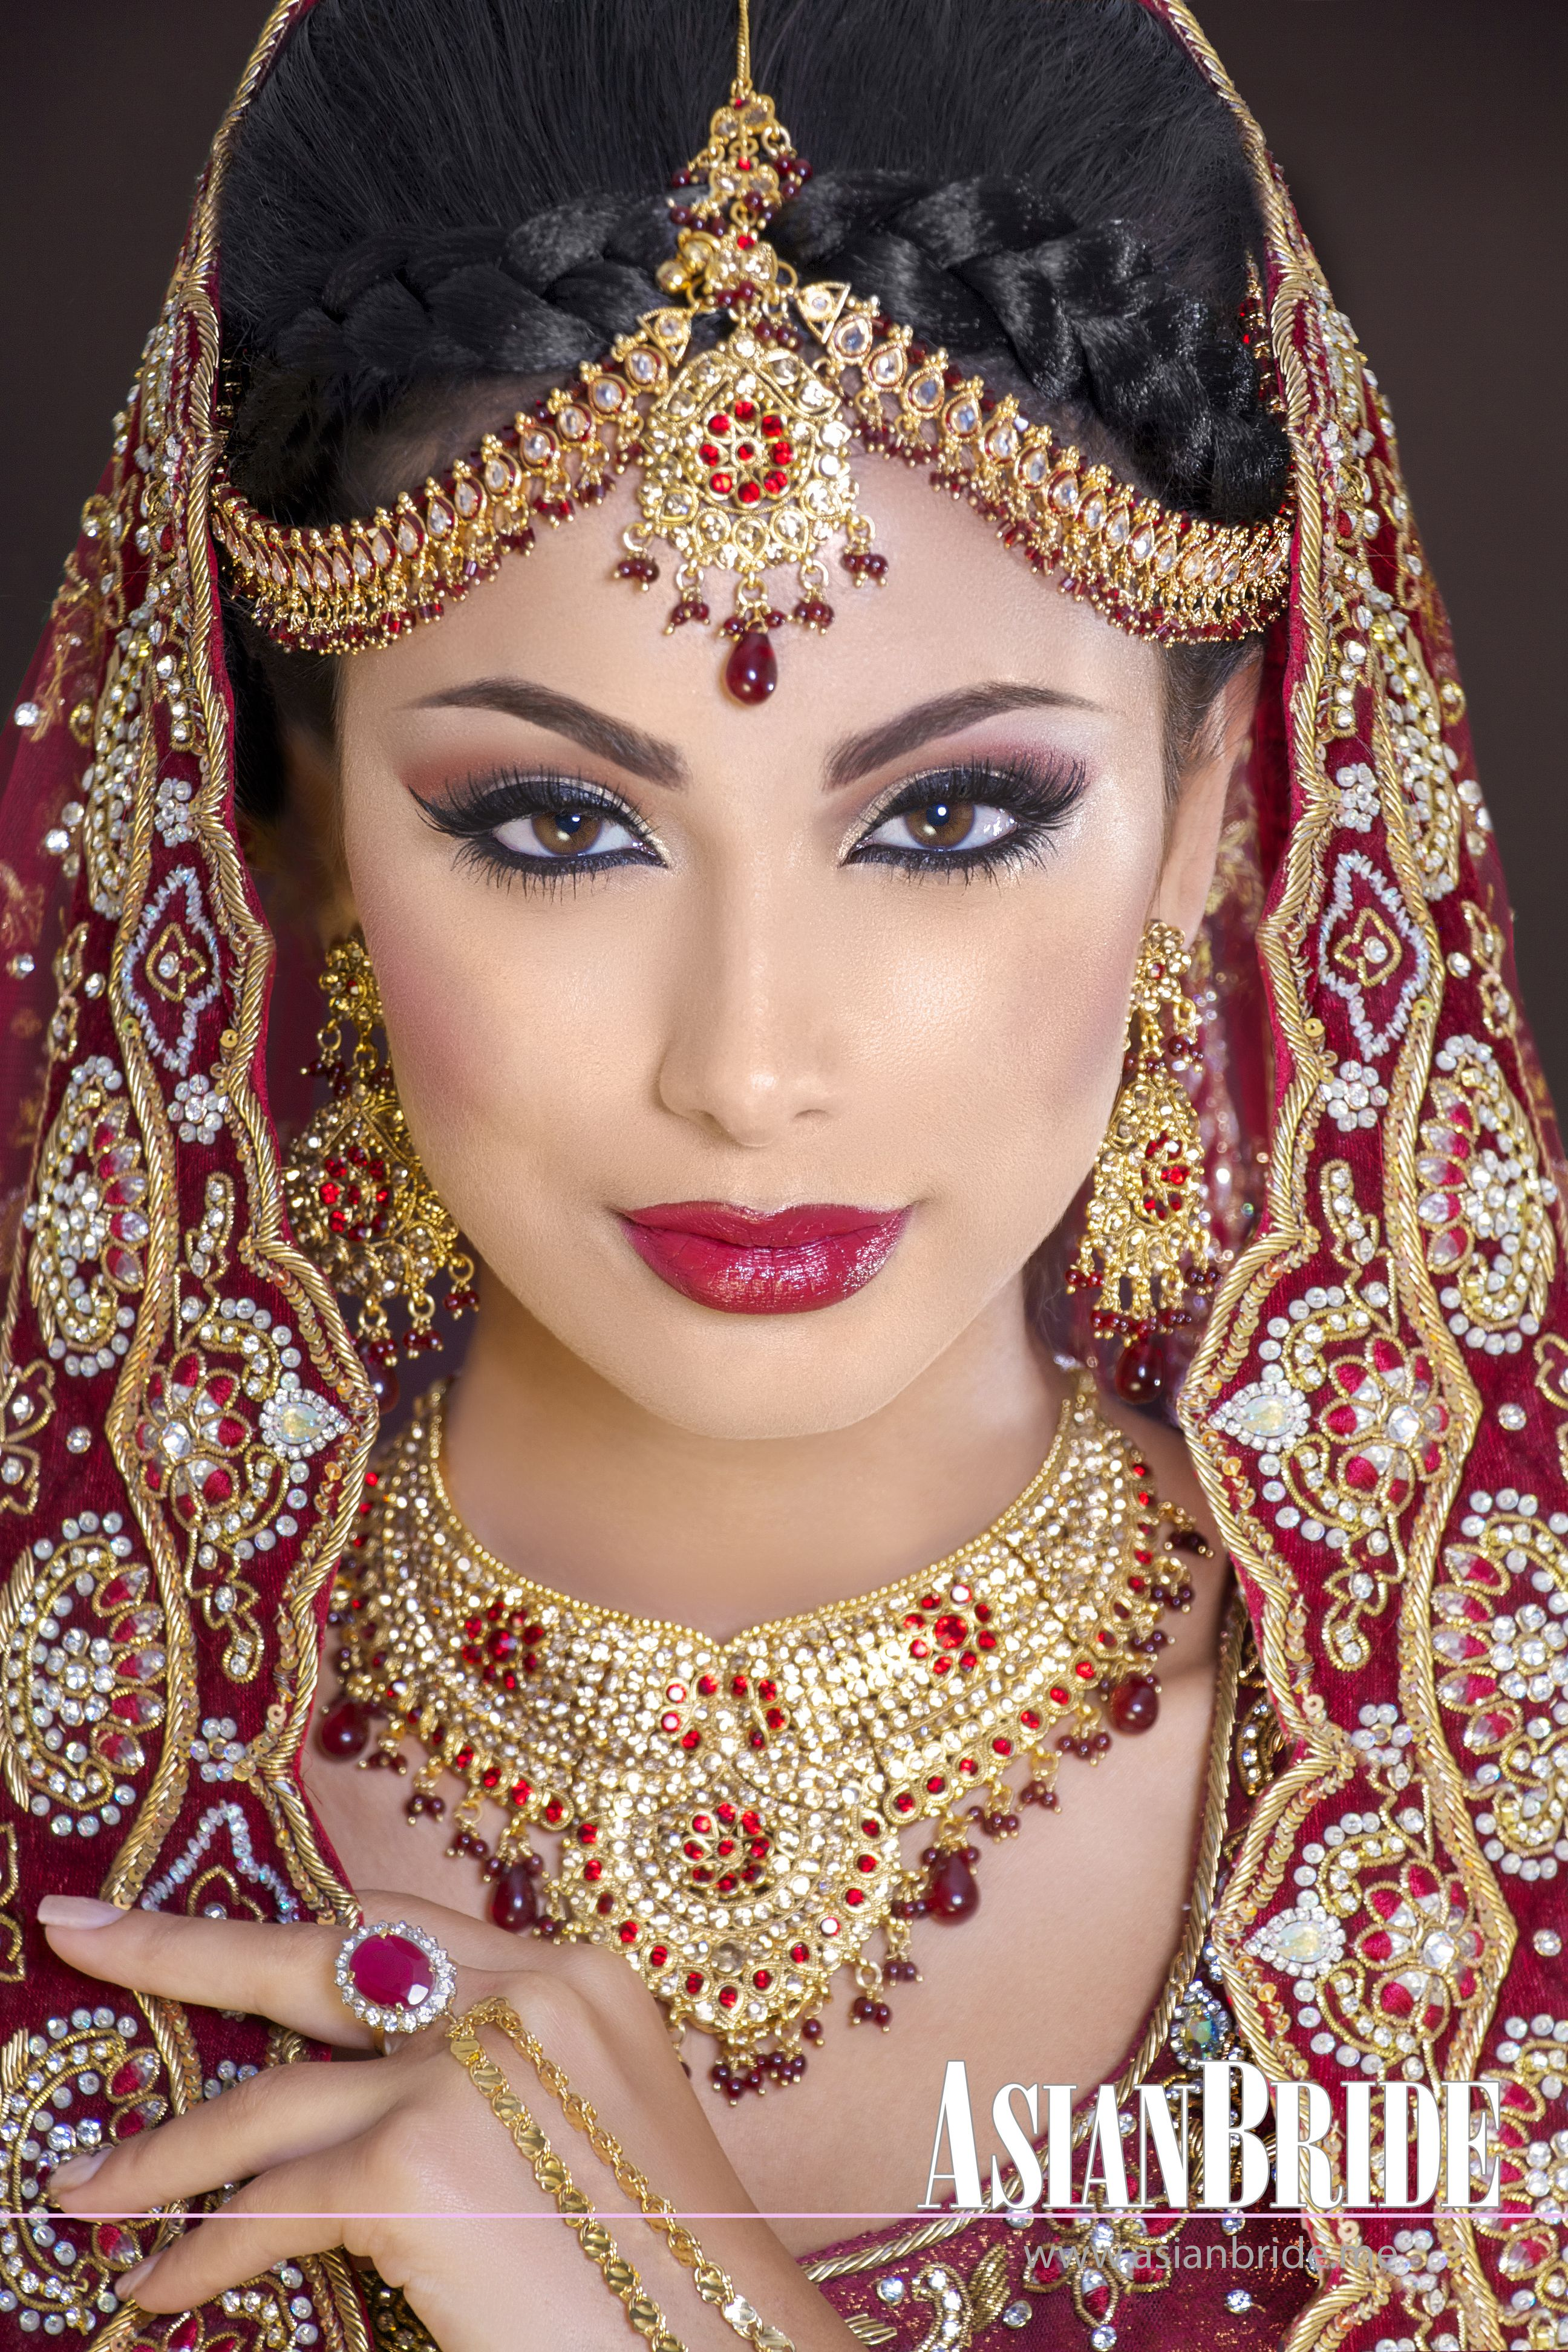 Prospective Asian Bride Or Thai 79